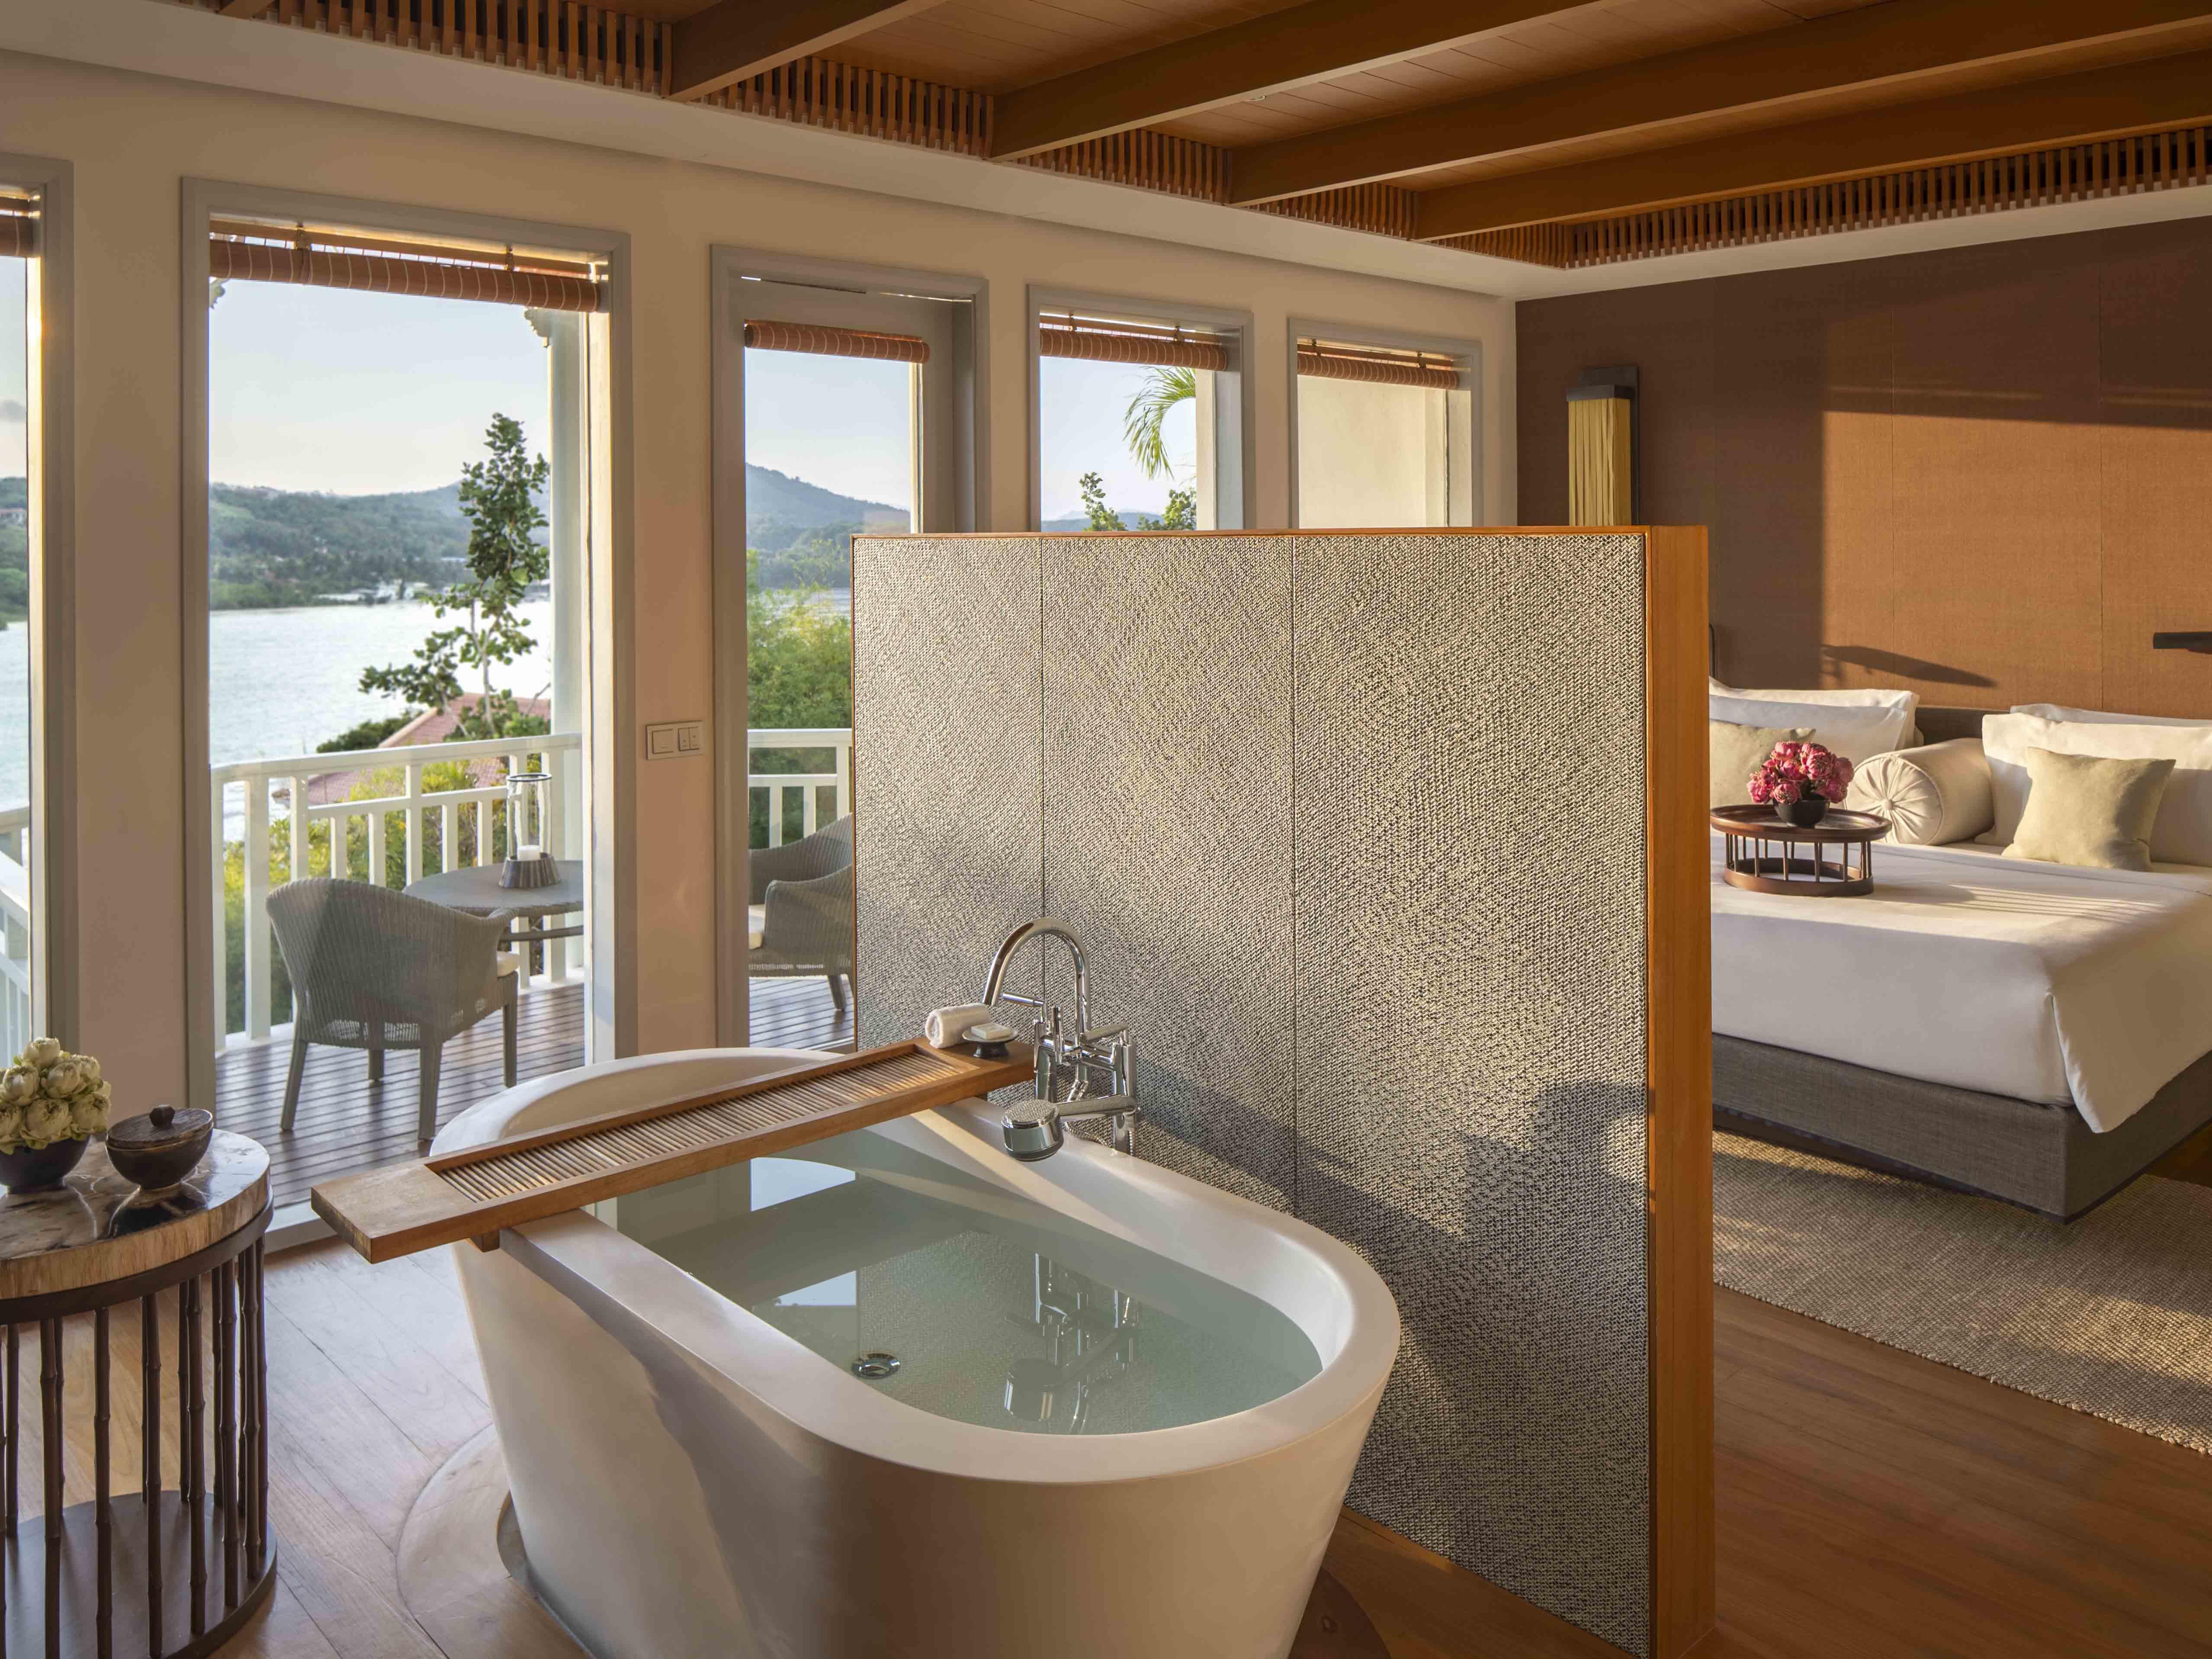 Amatara Wellness Resort Bay View Suite bath tub